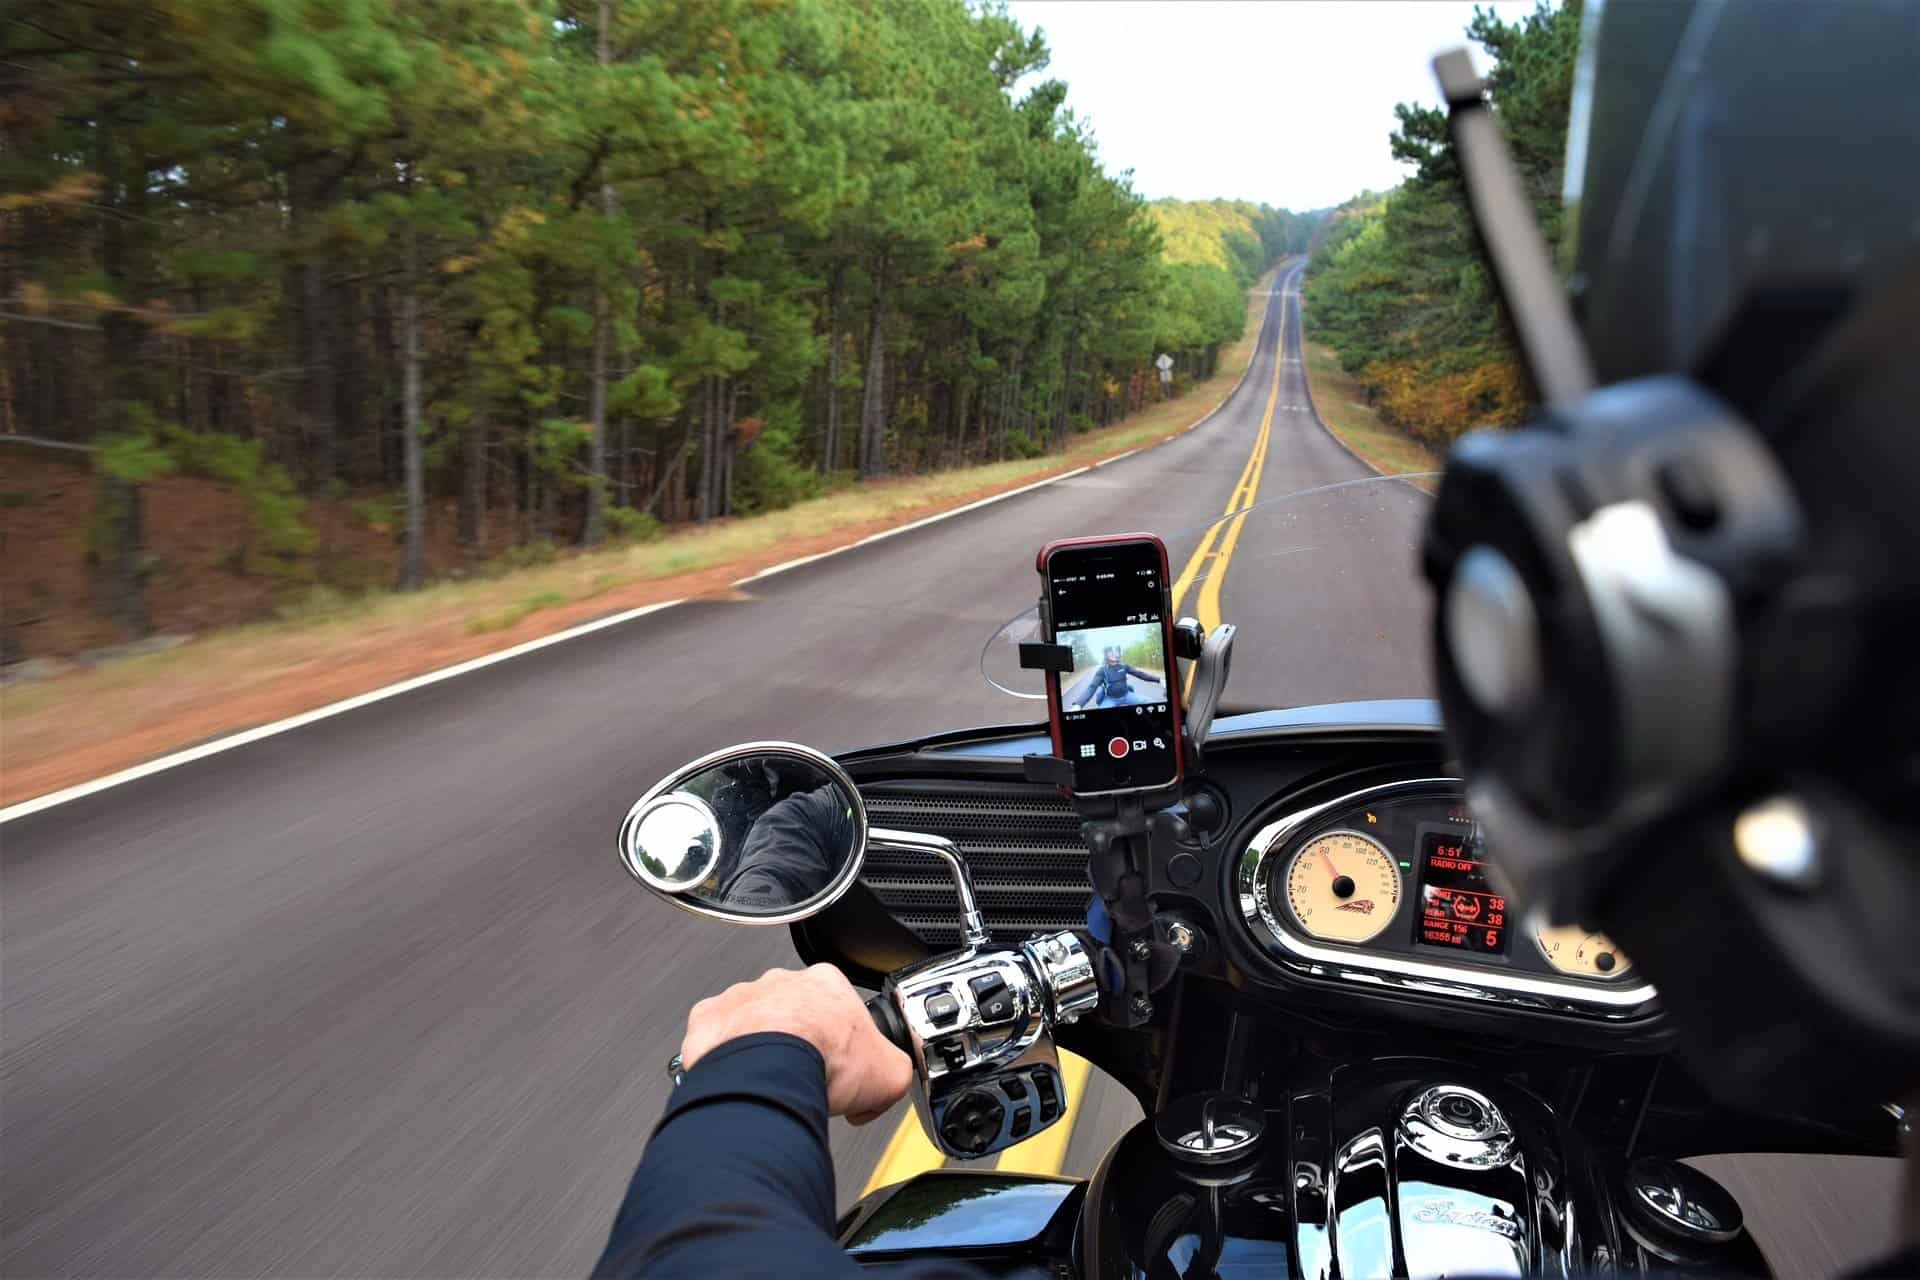 helmet with intercom phone